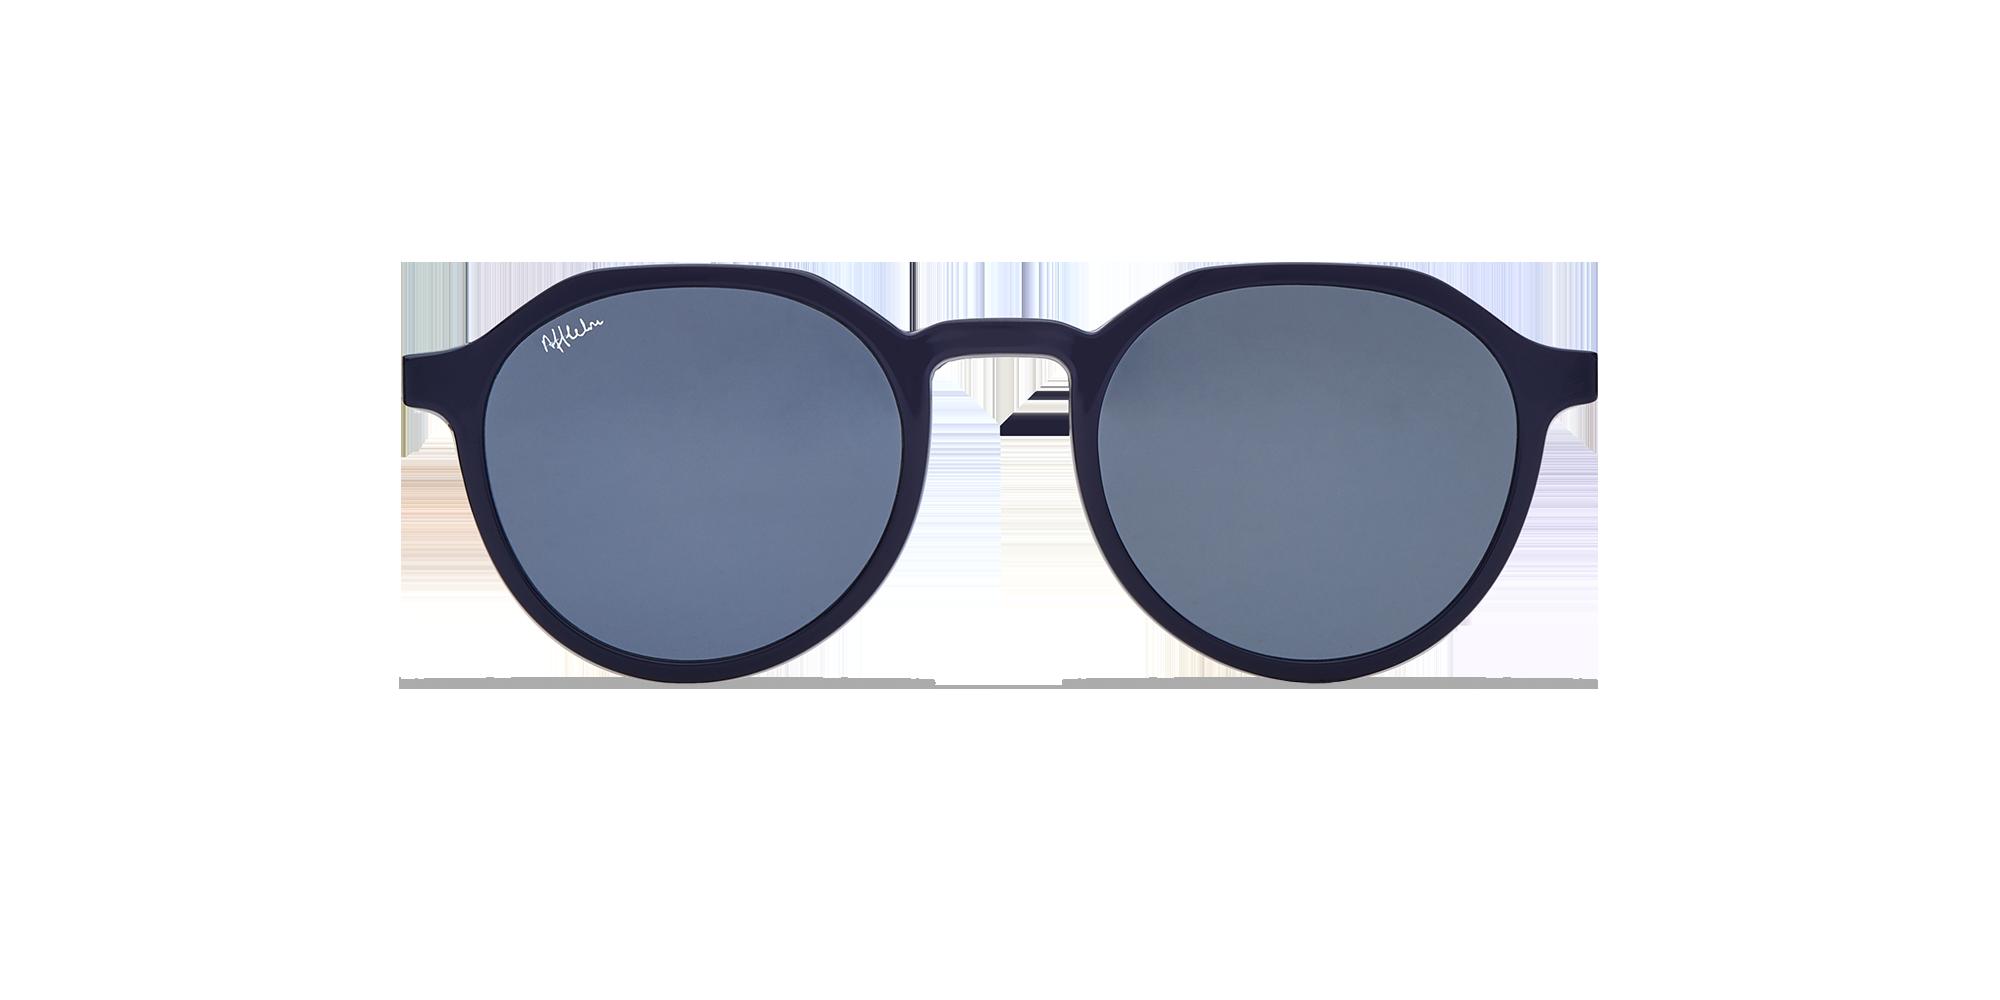 afflelou/france/products/smart_clip/clips_glasses/07630036428917_face.png